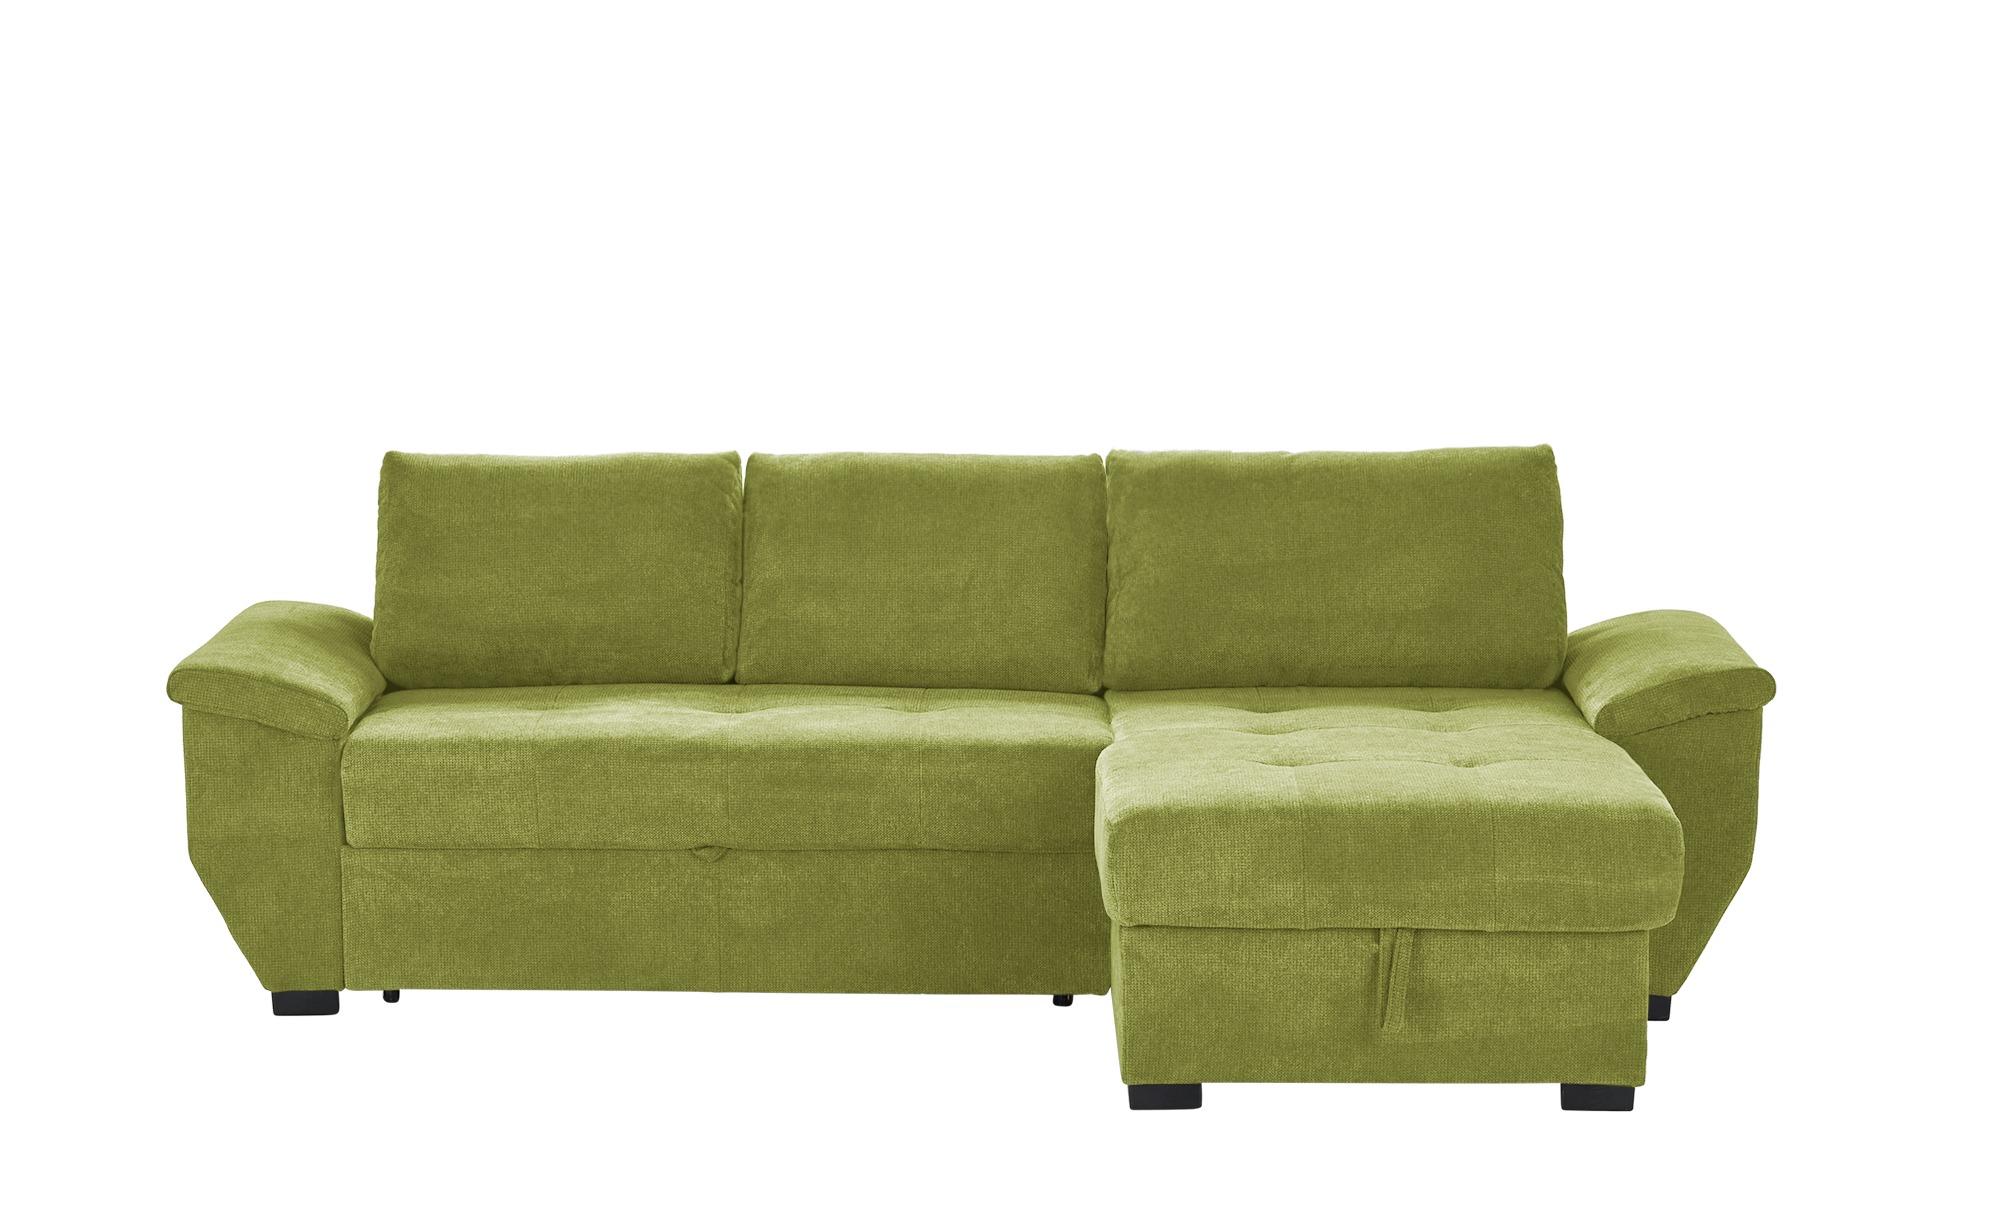 Ecksofa  Bulma ¦ grün ¦ Maße (cm): H: 84 Polstermöbel > Sofas > Ecksofas - Höffner